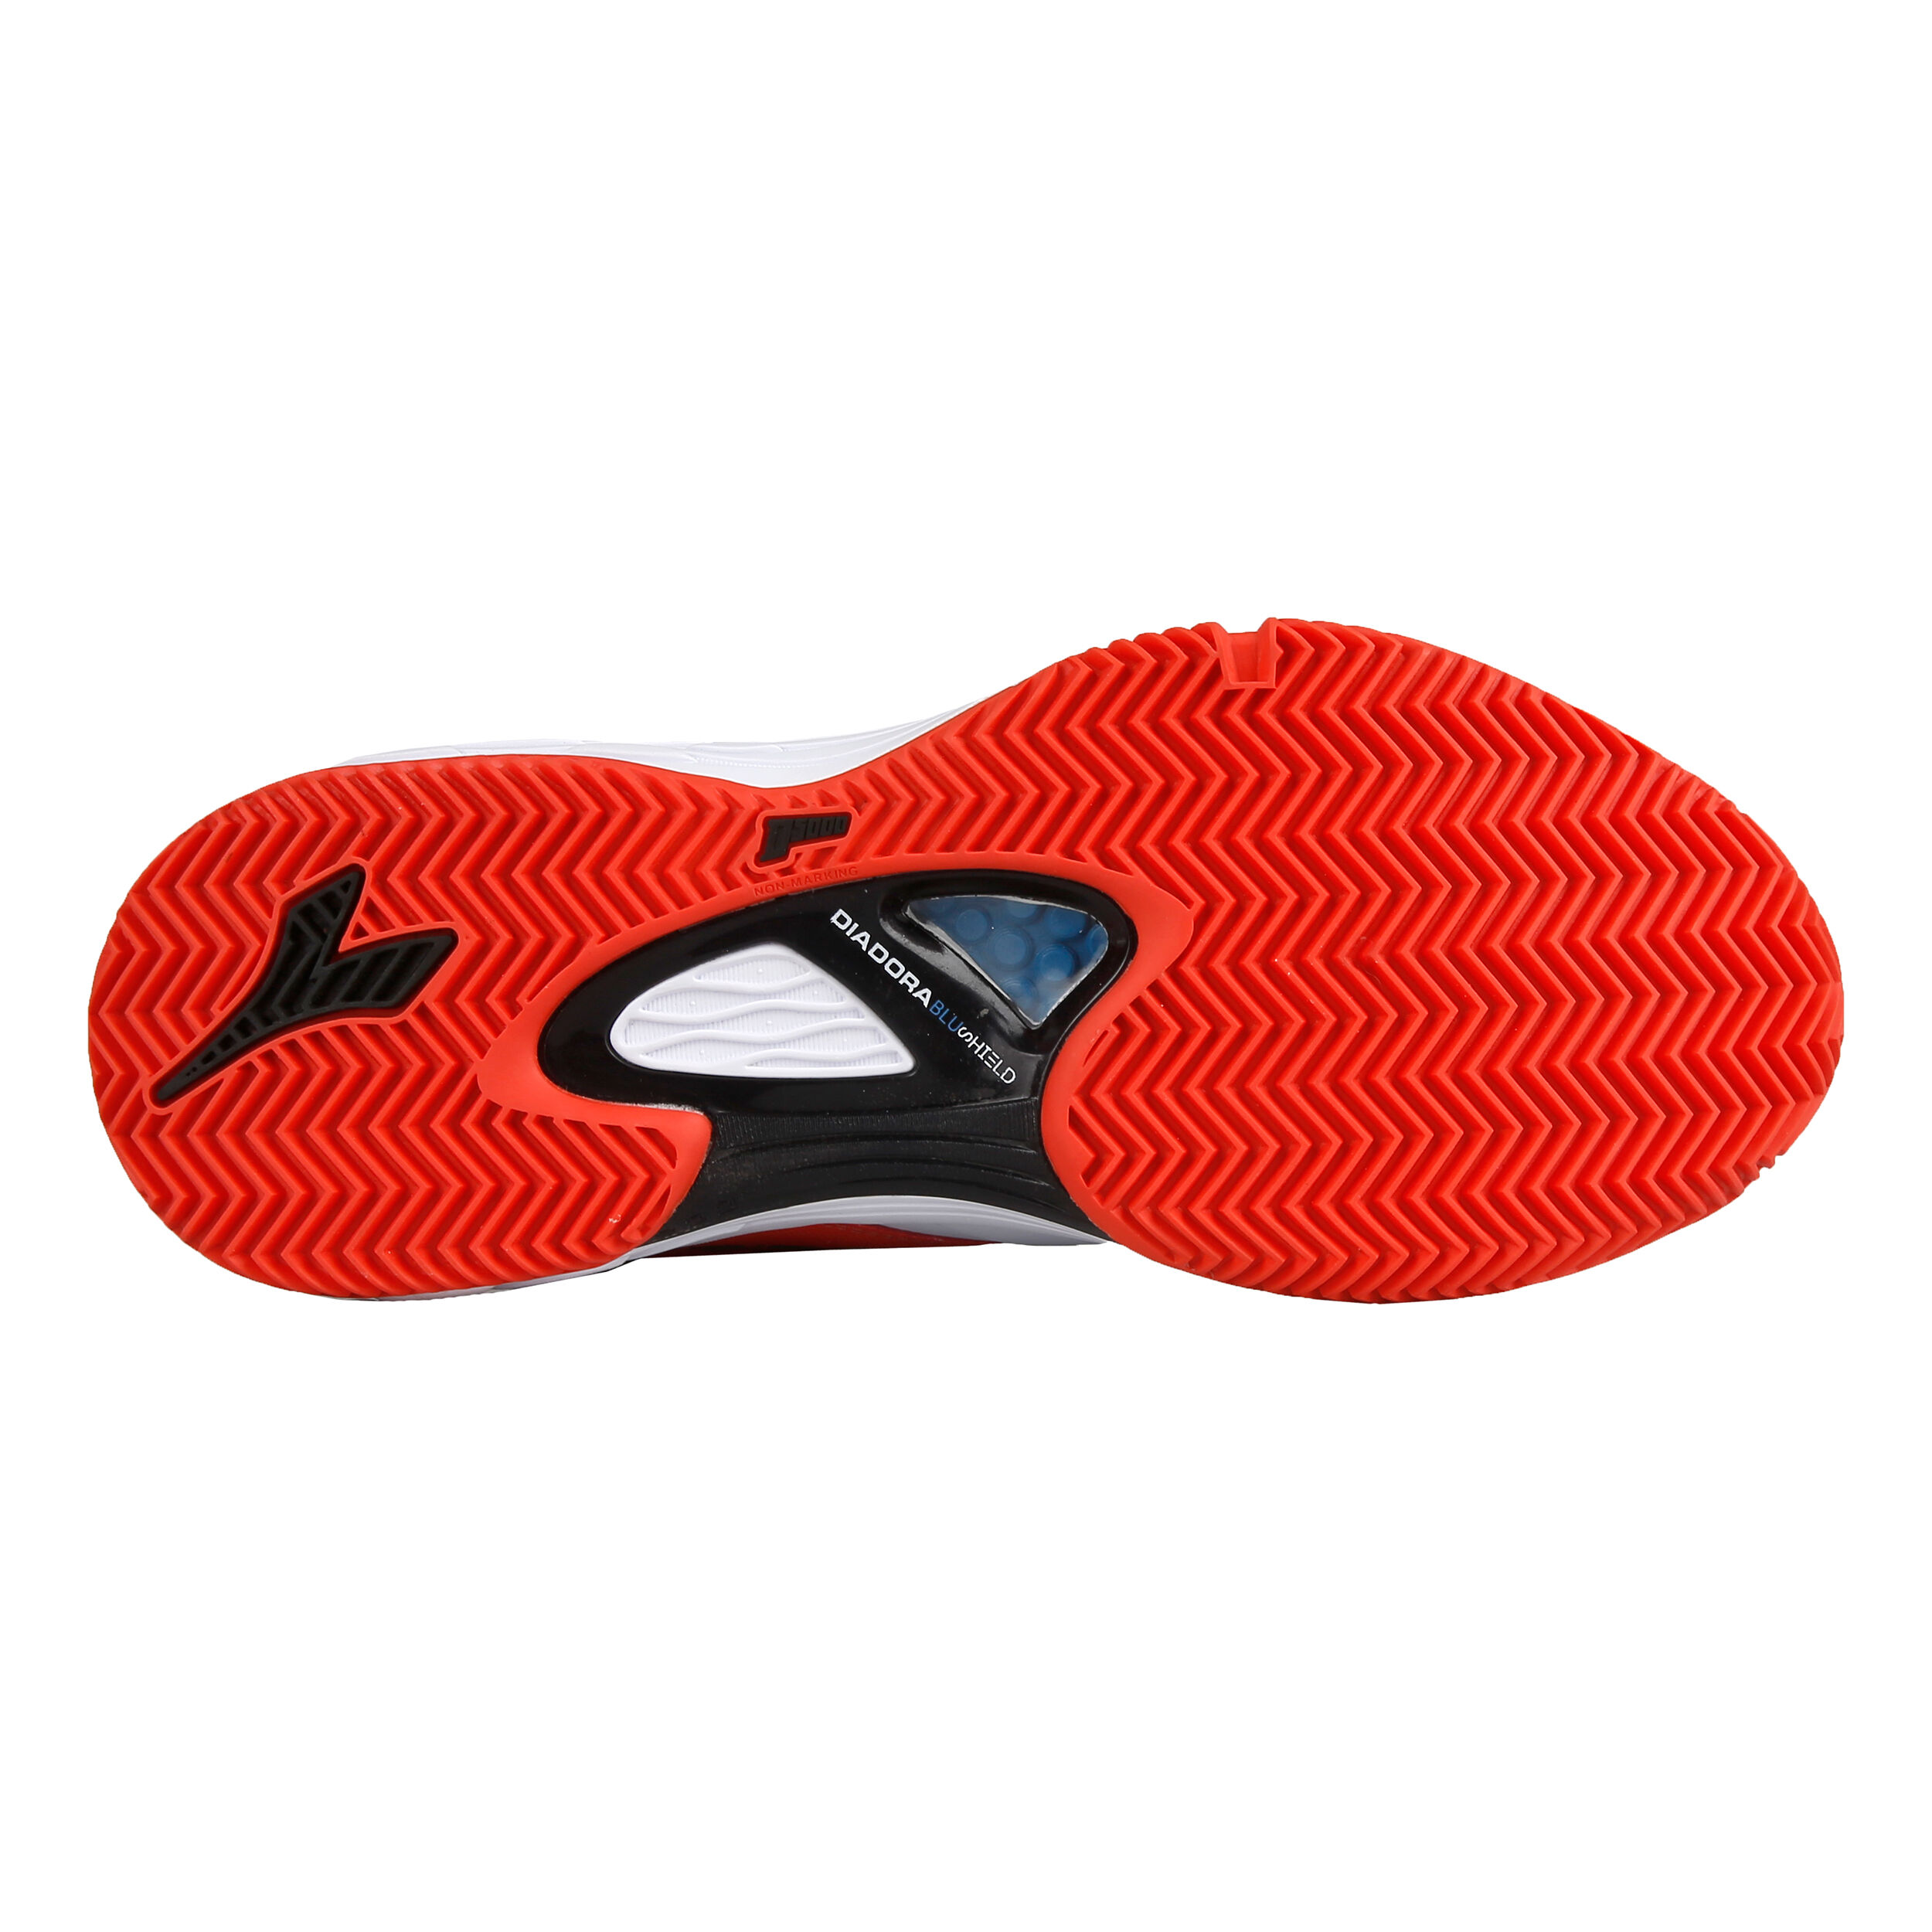 Diadora Speed Blushield Fly 2 Clay Scarpa Per Terra Rossa